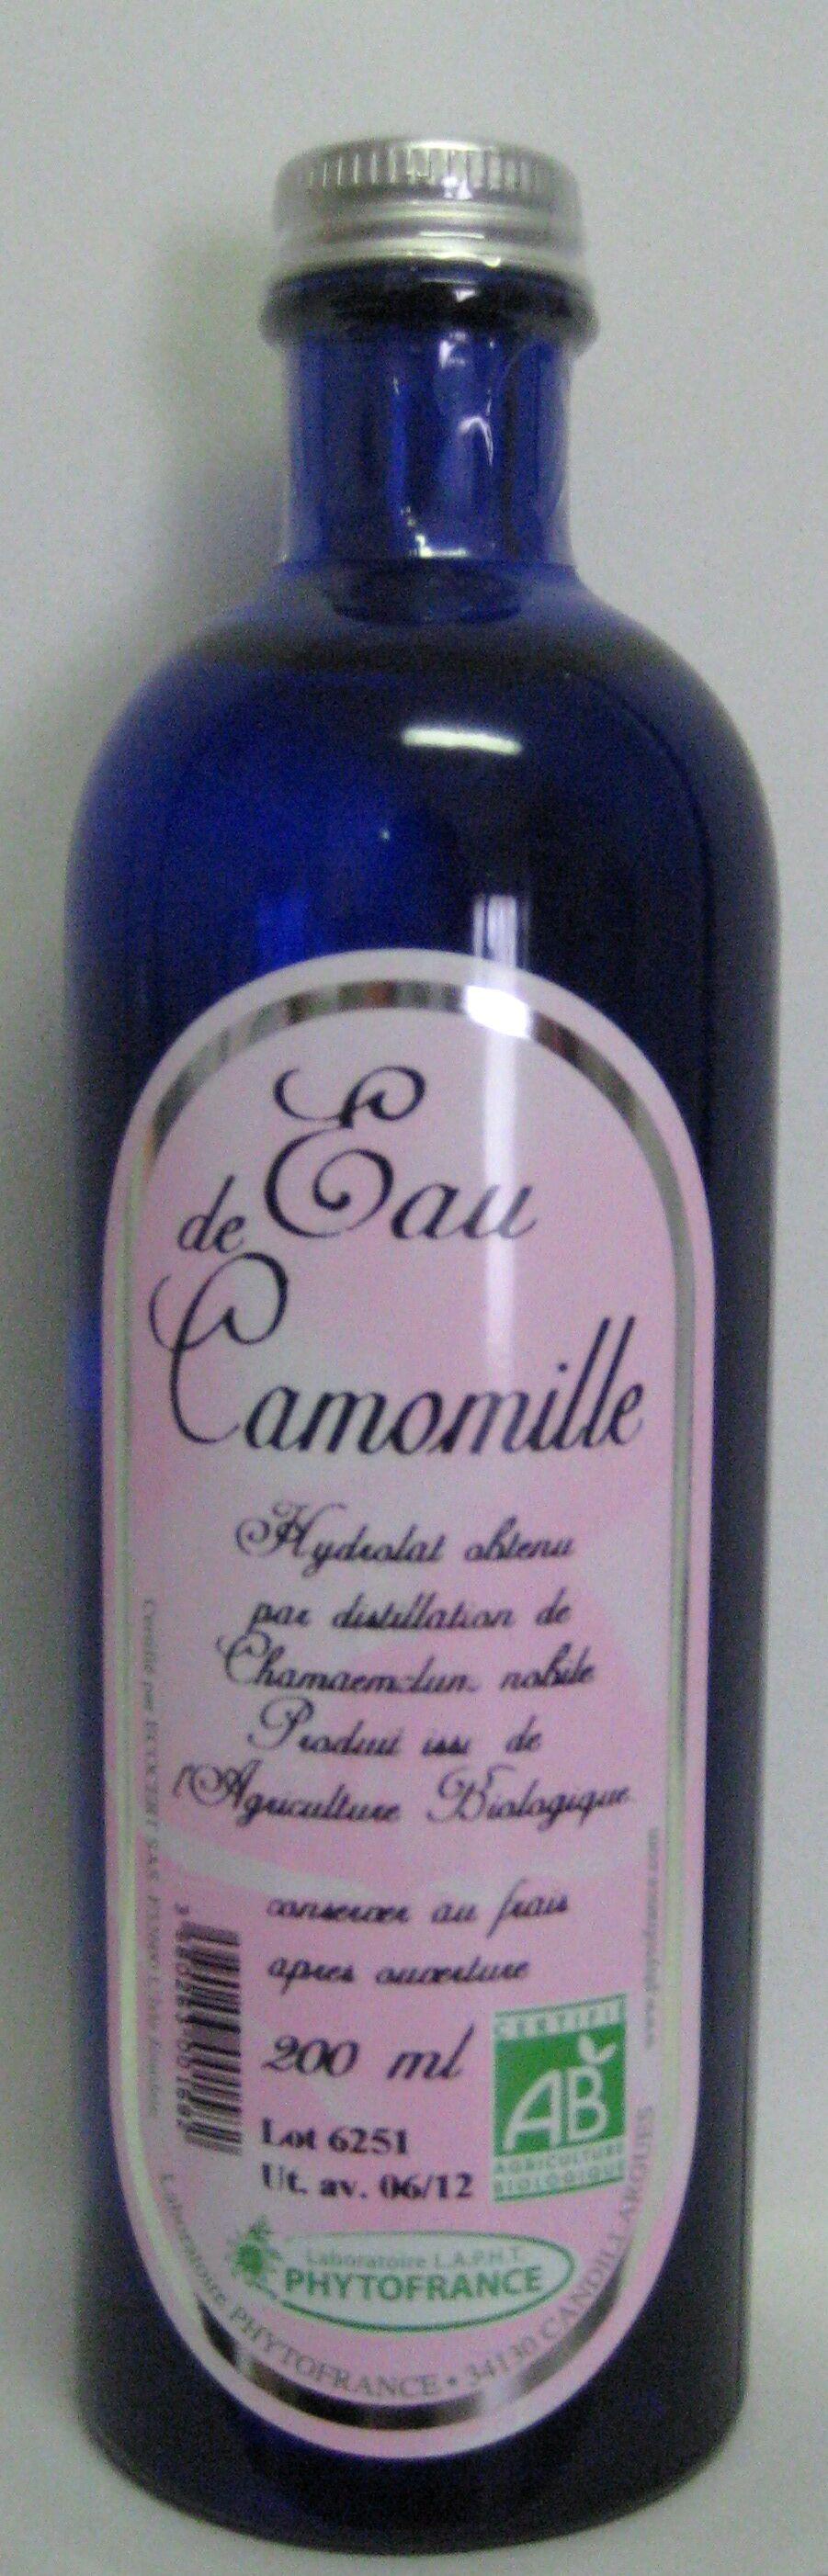 "Eyeslipsface ""Eau florale (hydrolat) de Camomille romaine - 200 ml - ESD / PHYTOFRANCE (4.6906) 200"""